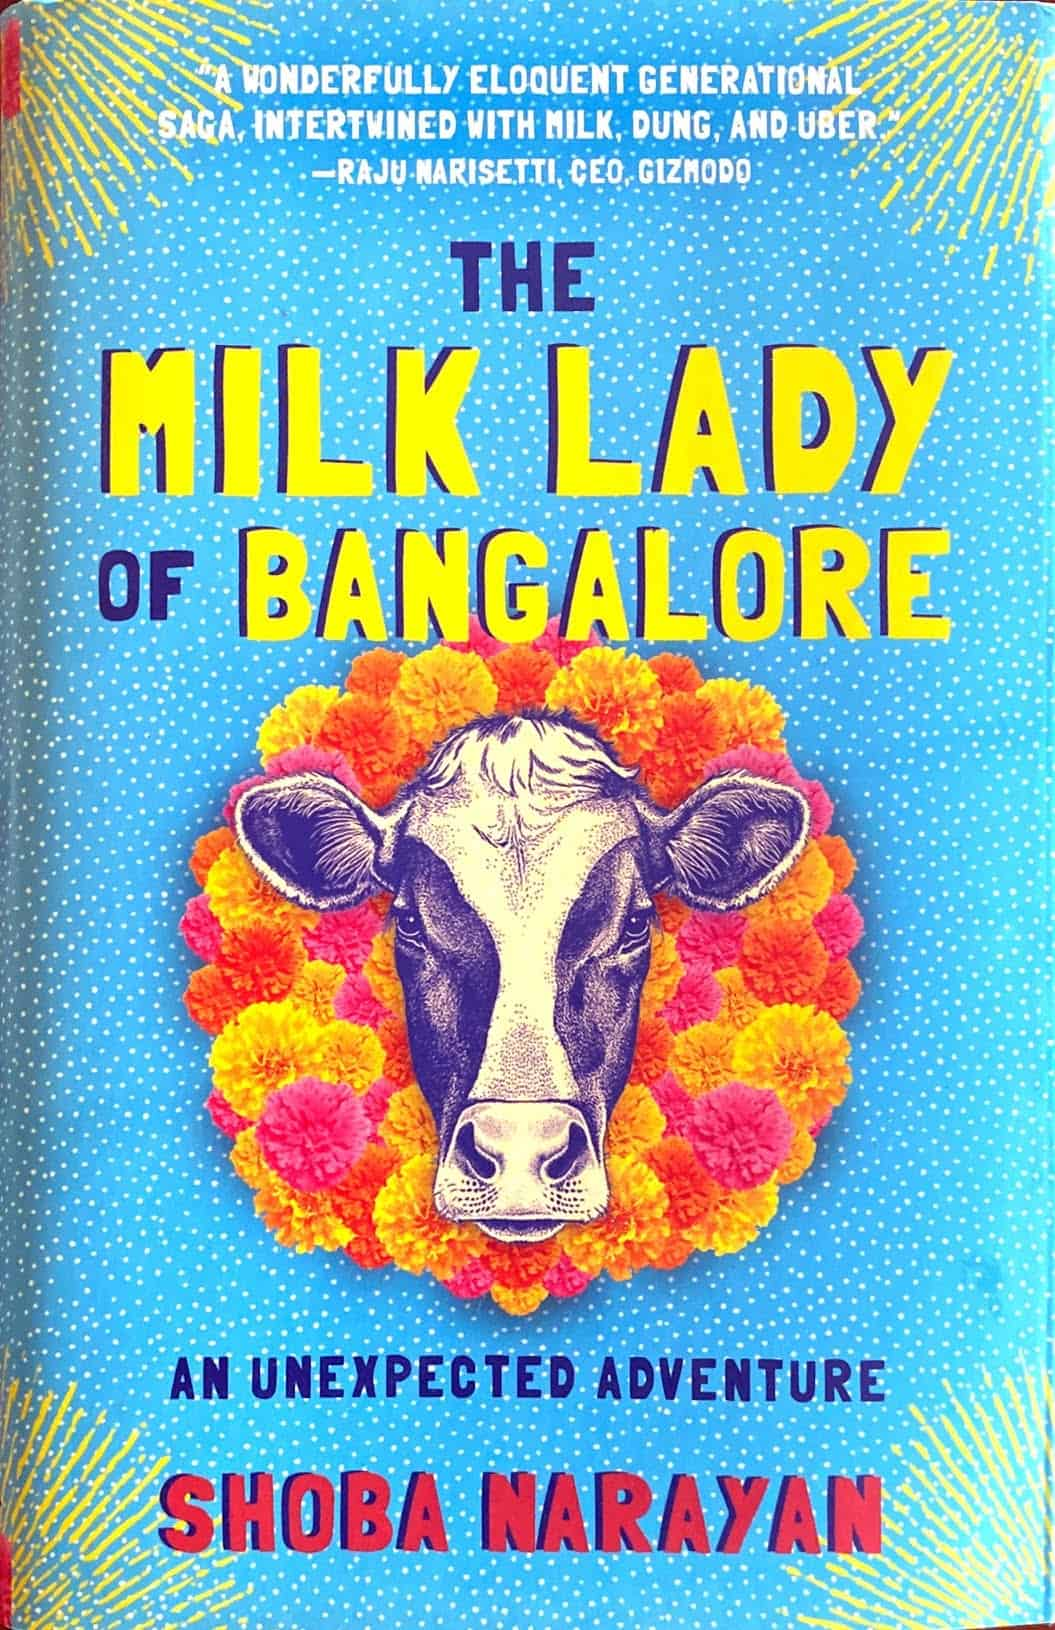 Hardcover edition of The Milk Lady of Bangalore by Shoba Narayan